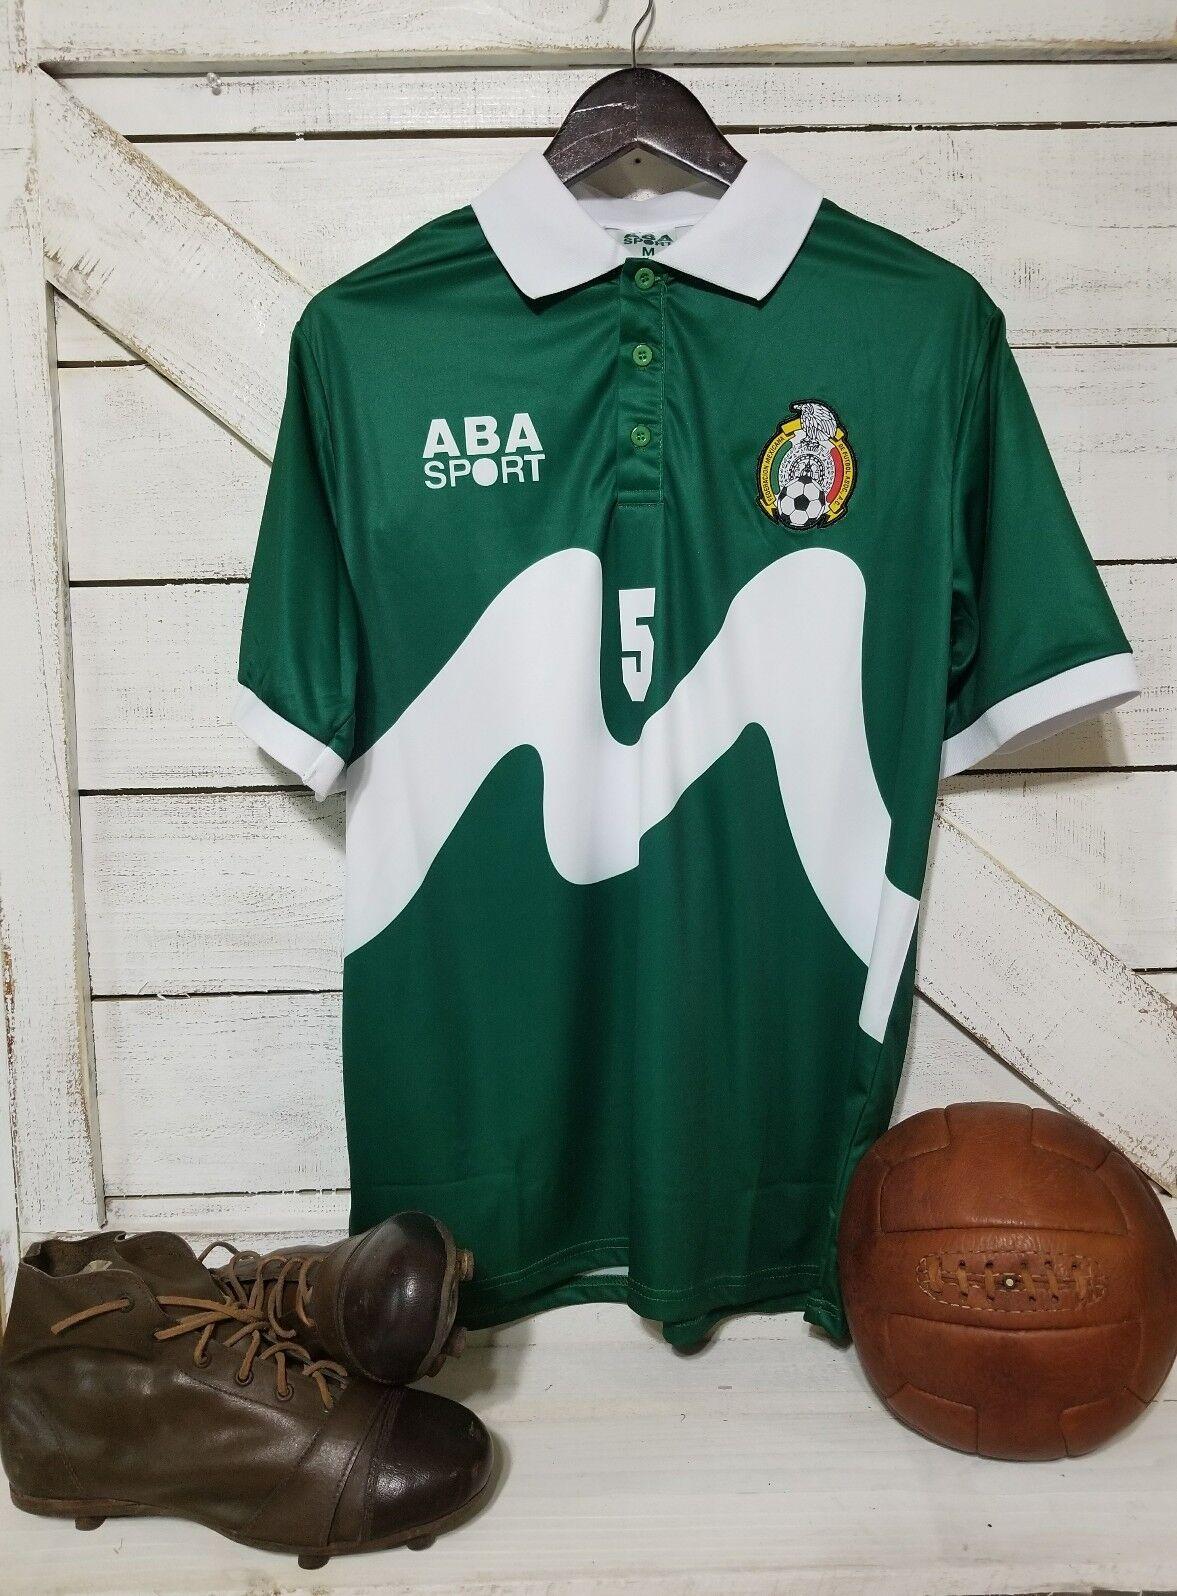 ABA Sport Mexico 1995 Ramon RAMIREZ \ 5 groen Retro Jersey afmeting L